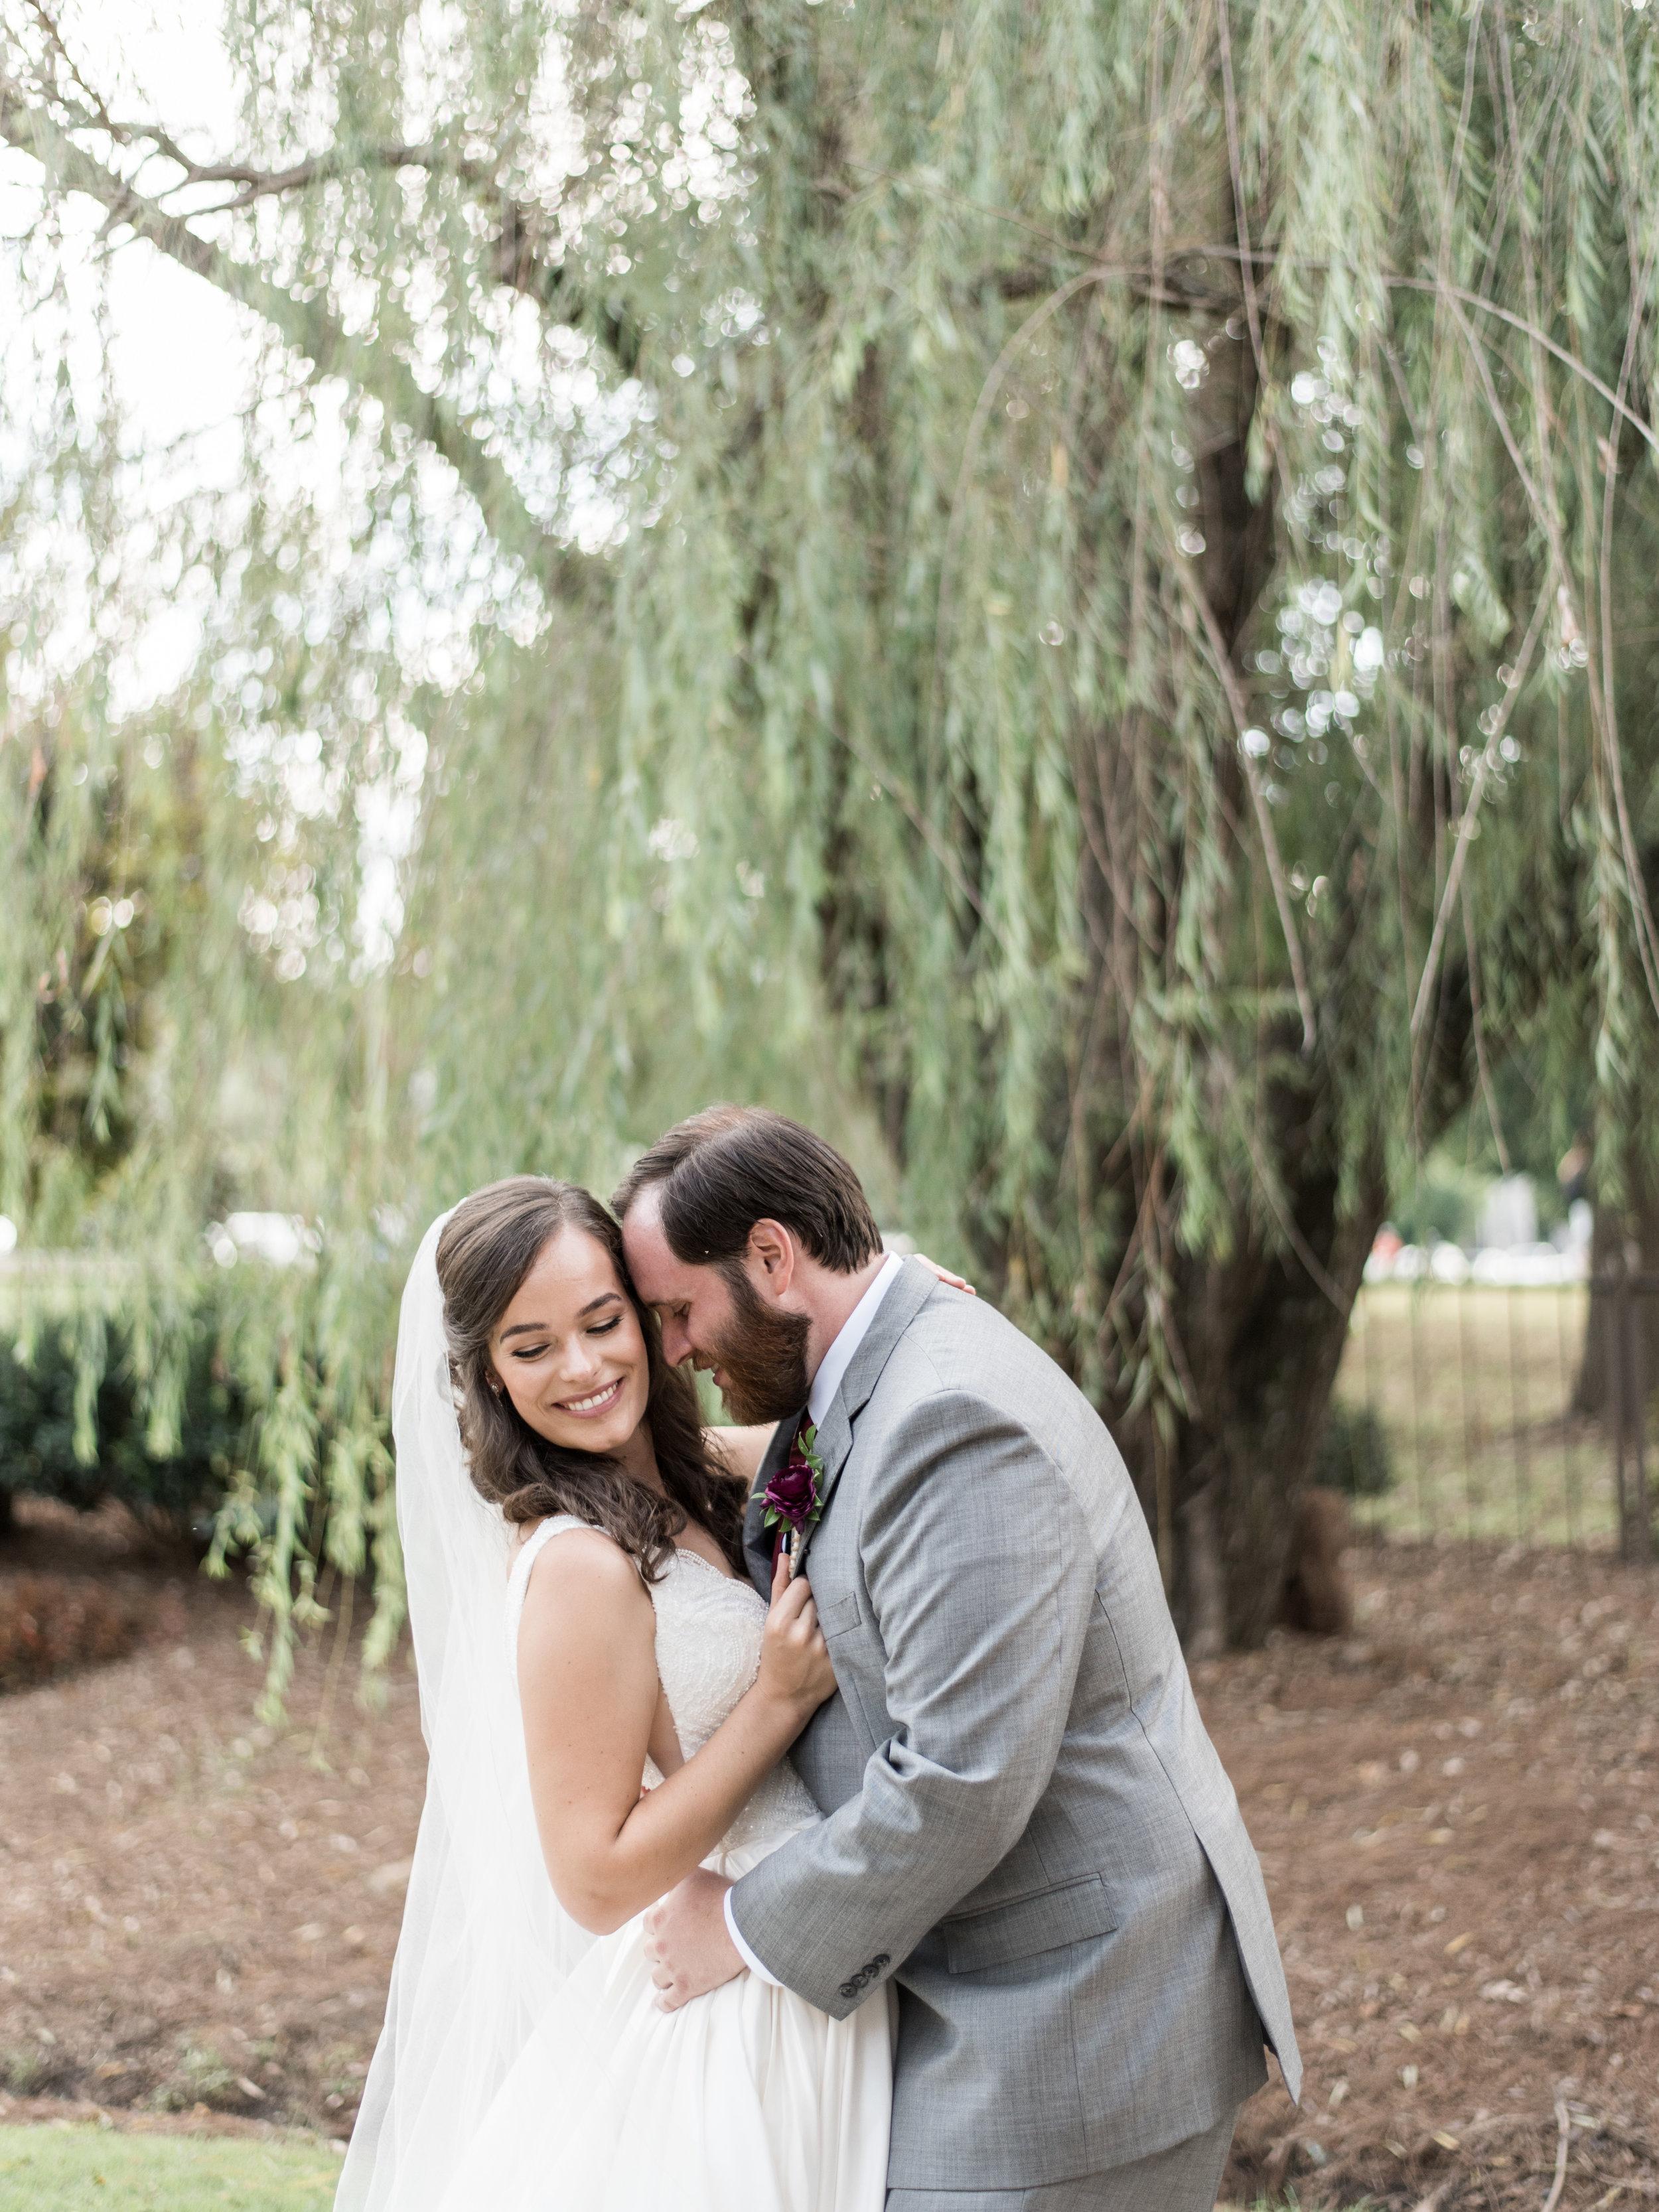 Wedding at the park tavern in Atlanta